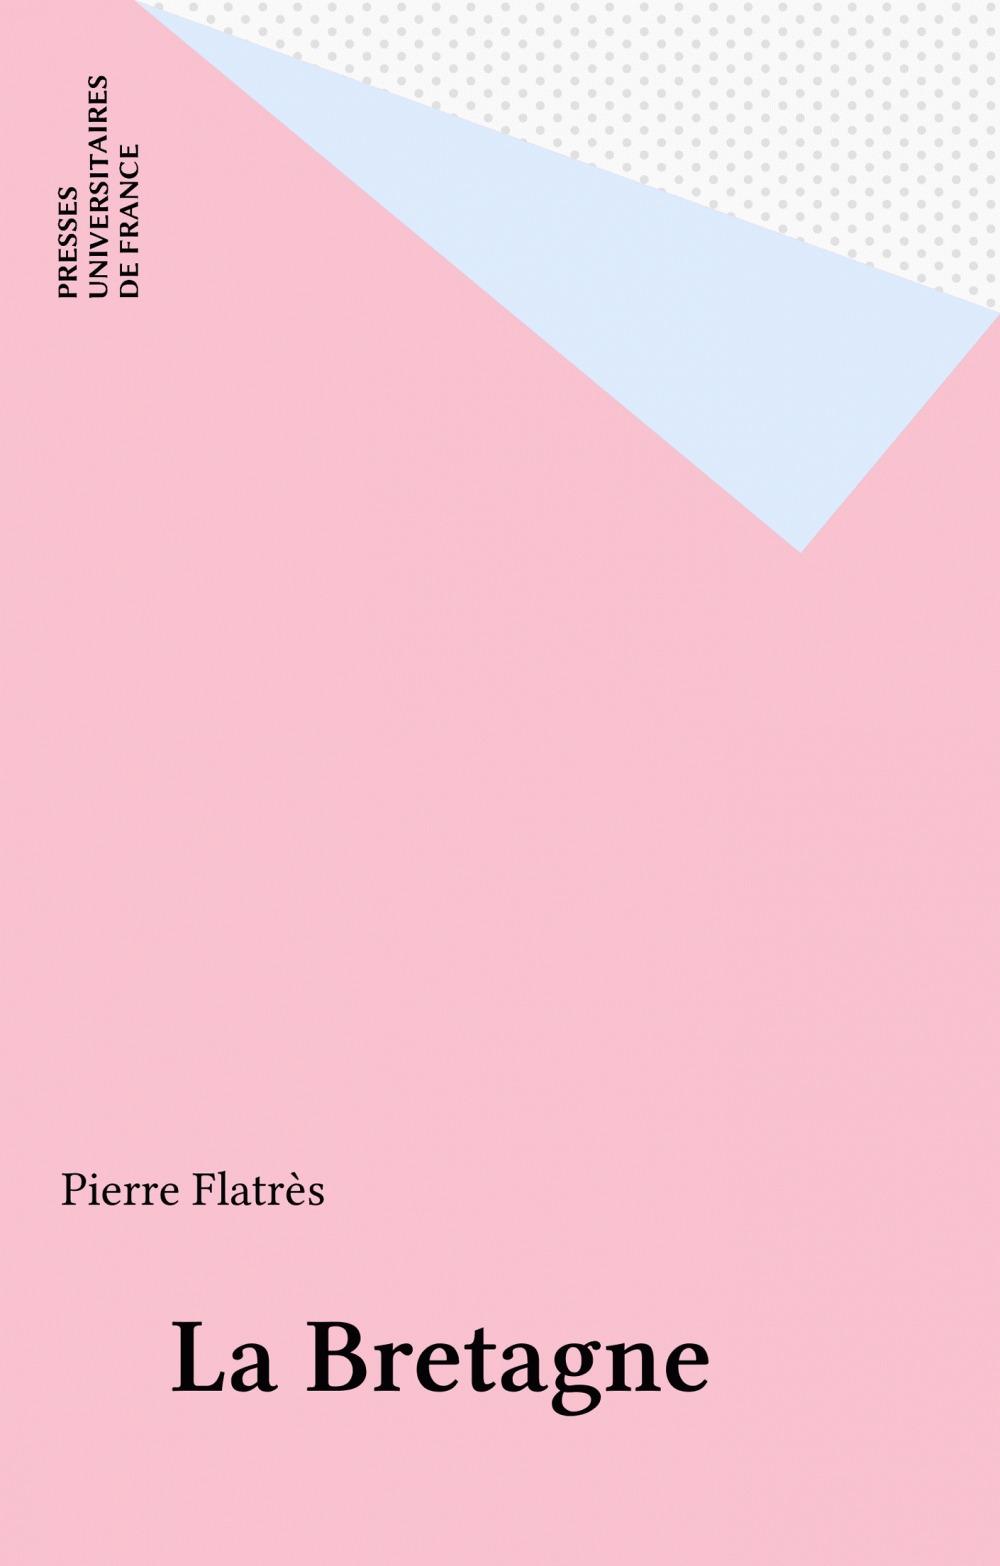 La Bretagne  - Pierre Flatrès  - Flatres